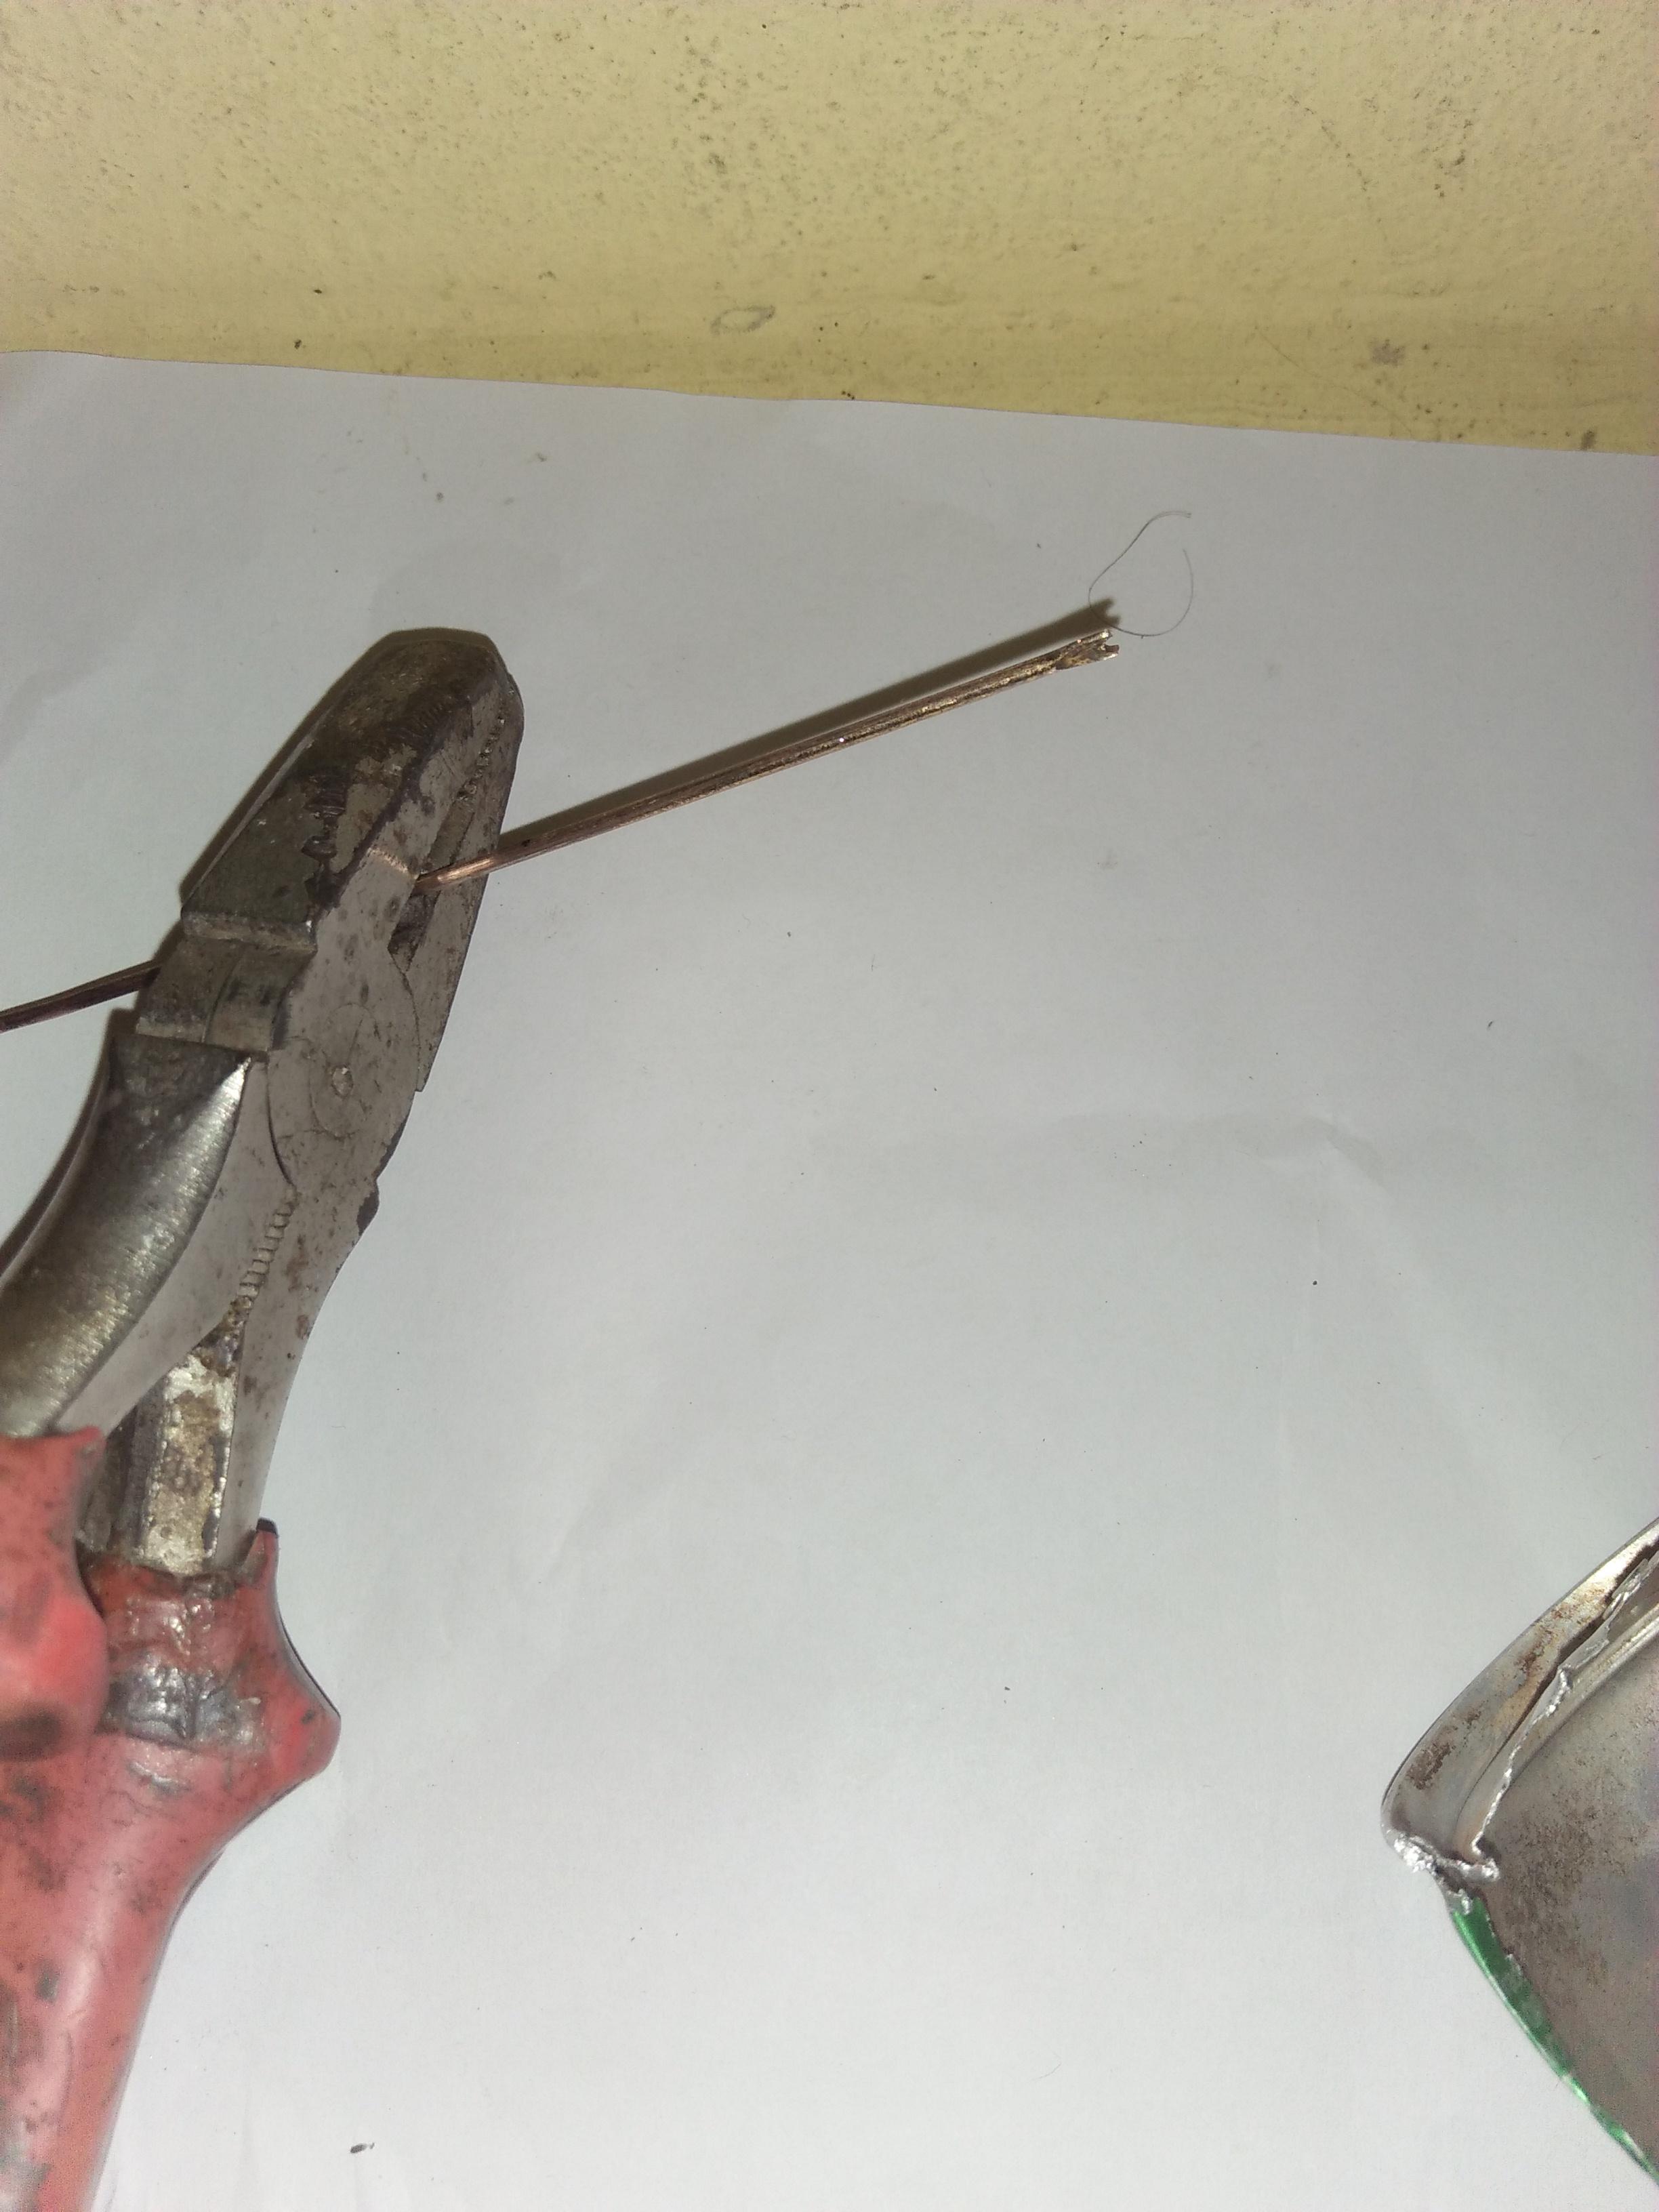 Picture of Cut Aluminum Wire